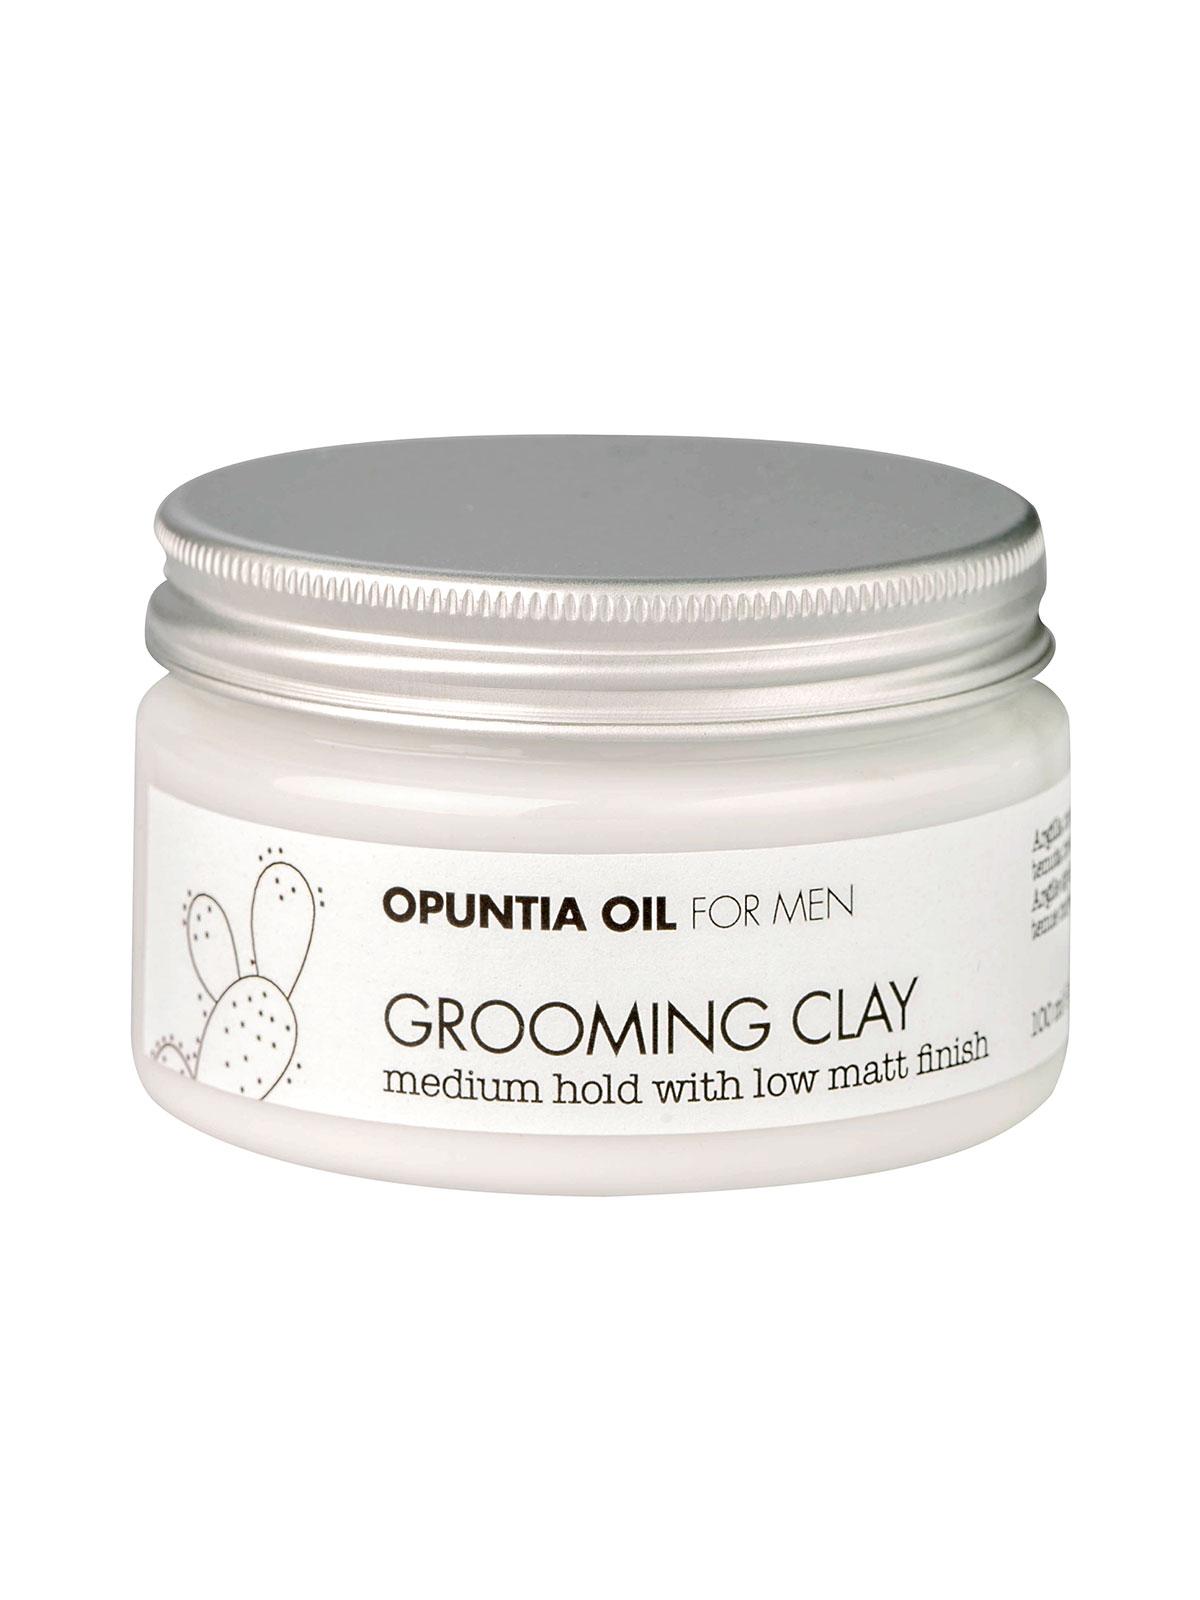 Rica Opuntia Grooming Clay